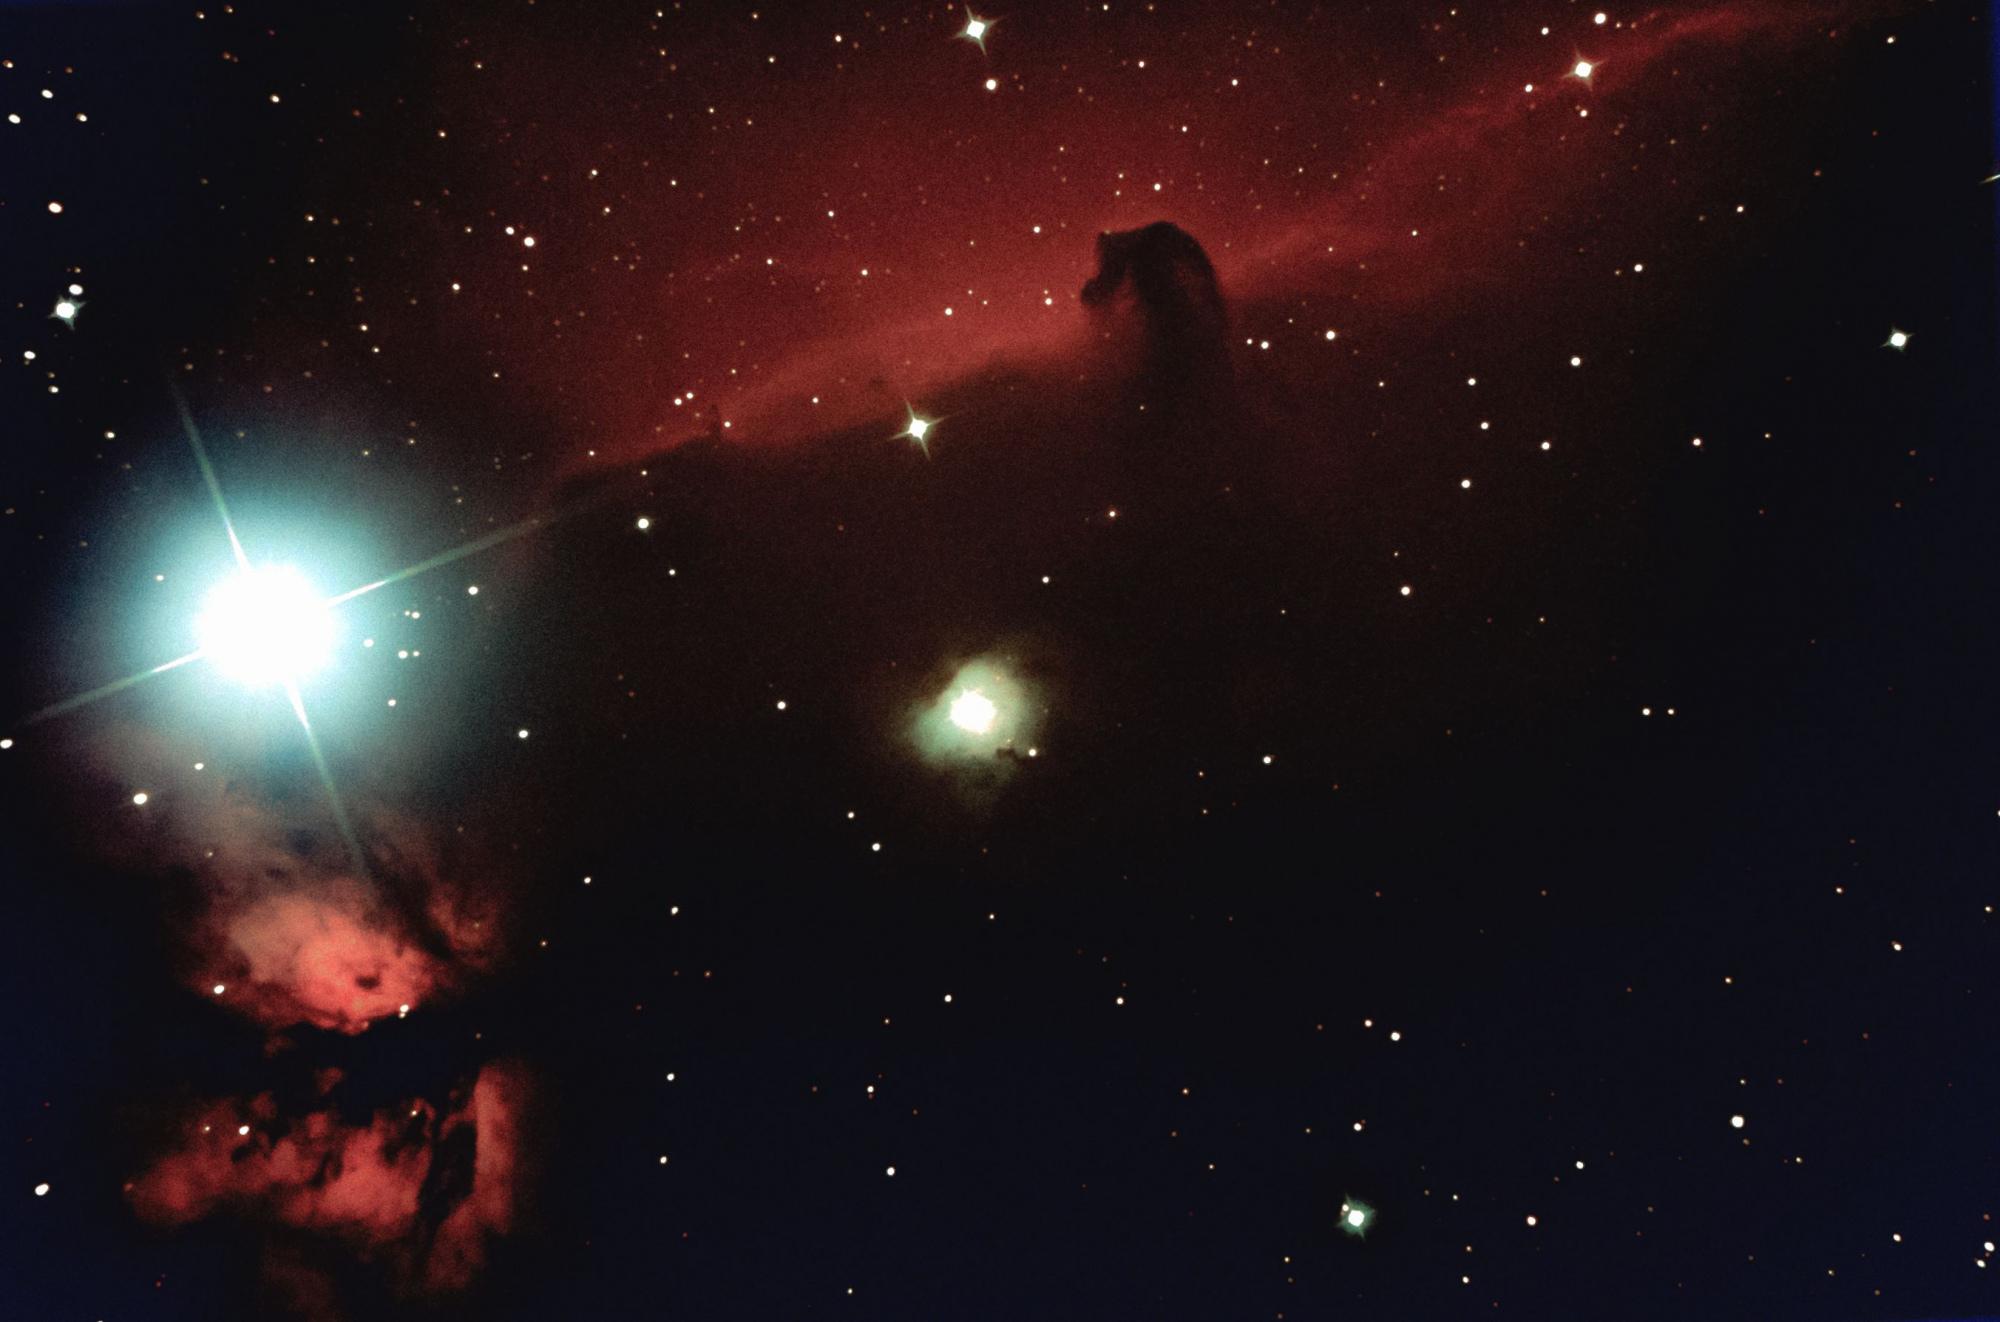 60761cc071ae7_IC0434_et_NGC2024_V2_jpgedited.thumb.jpg.df2aff606c6af58551331275d0f17d93.jpg